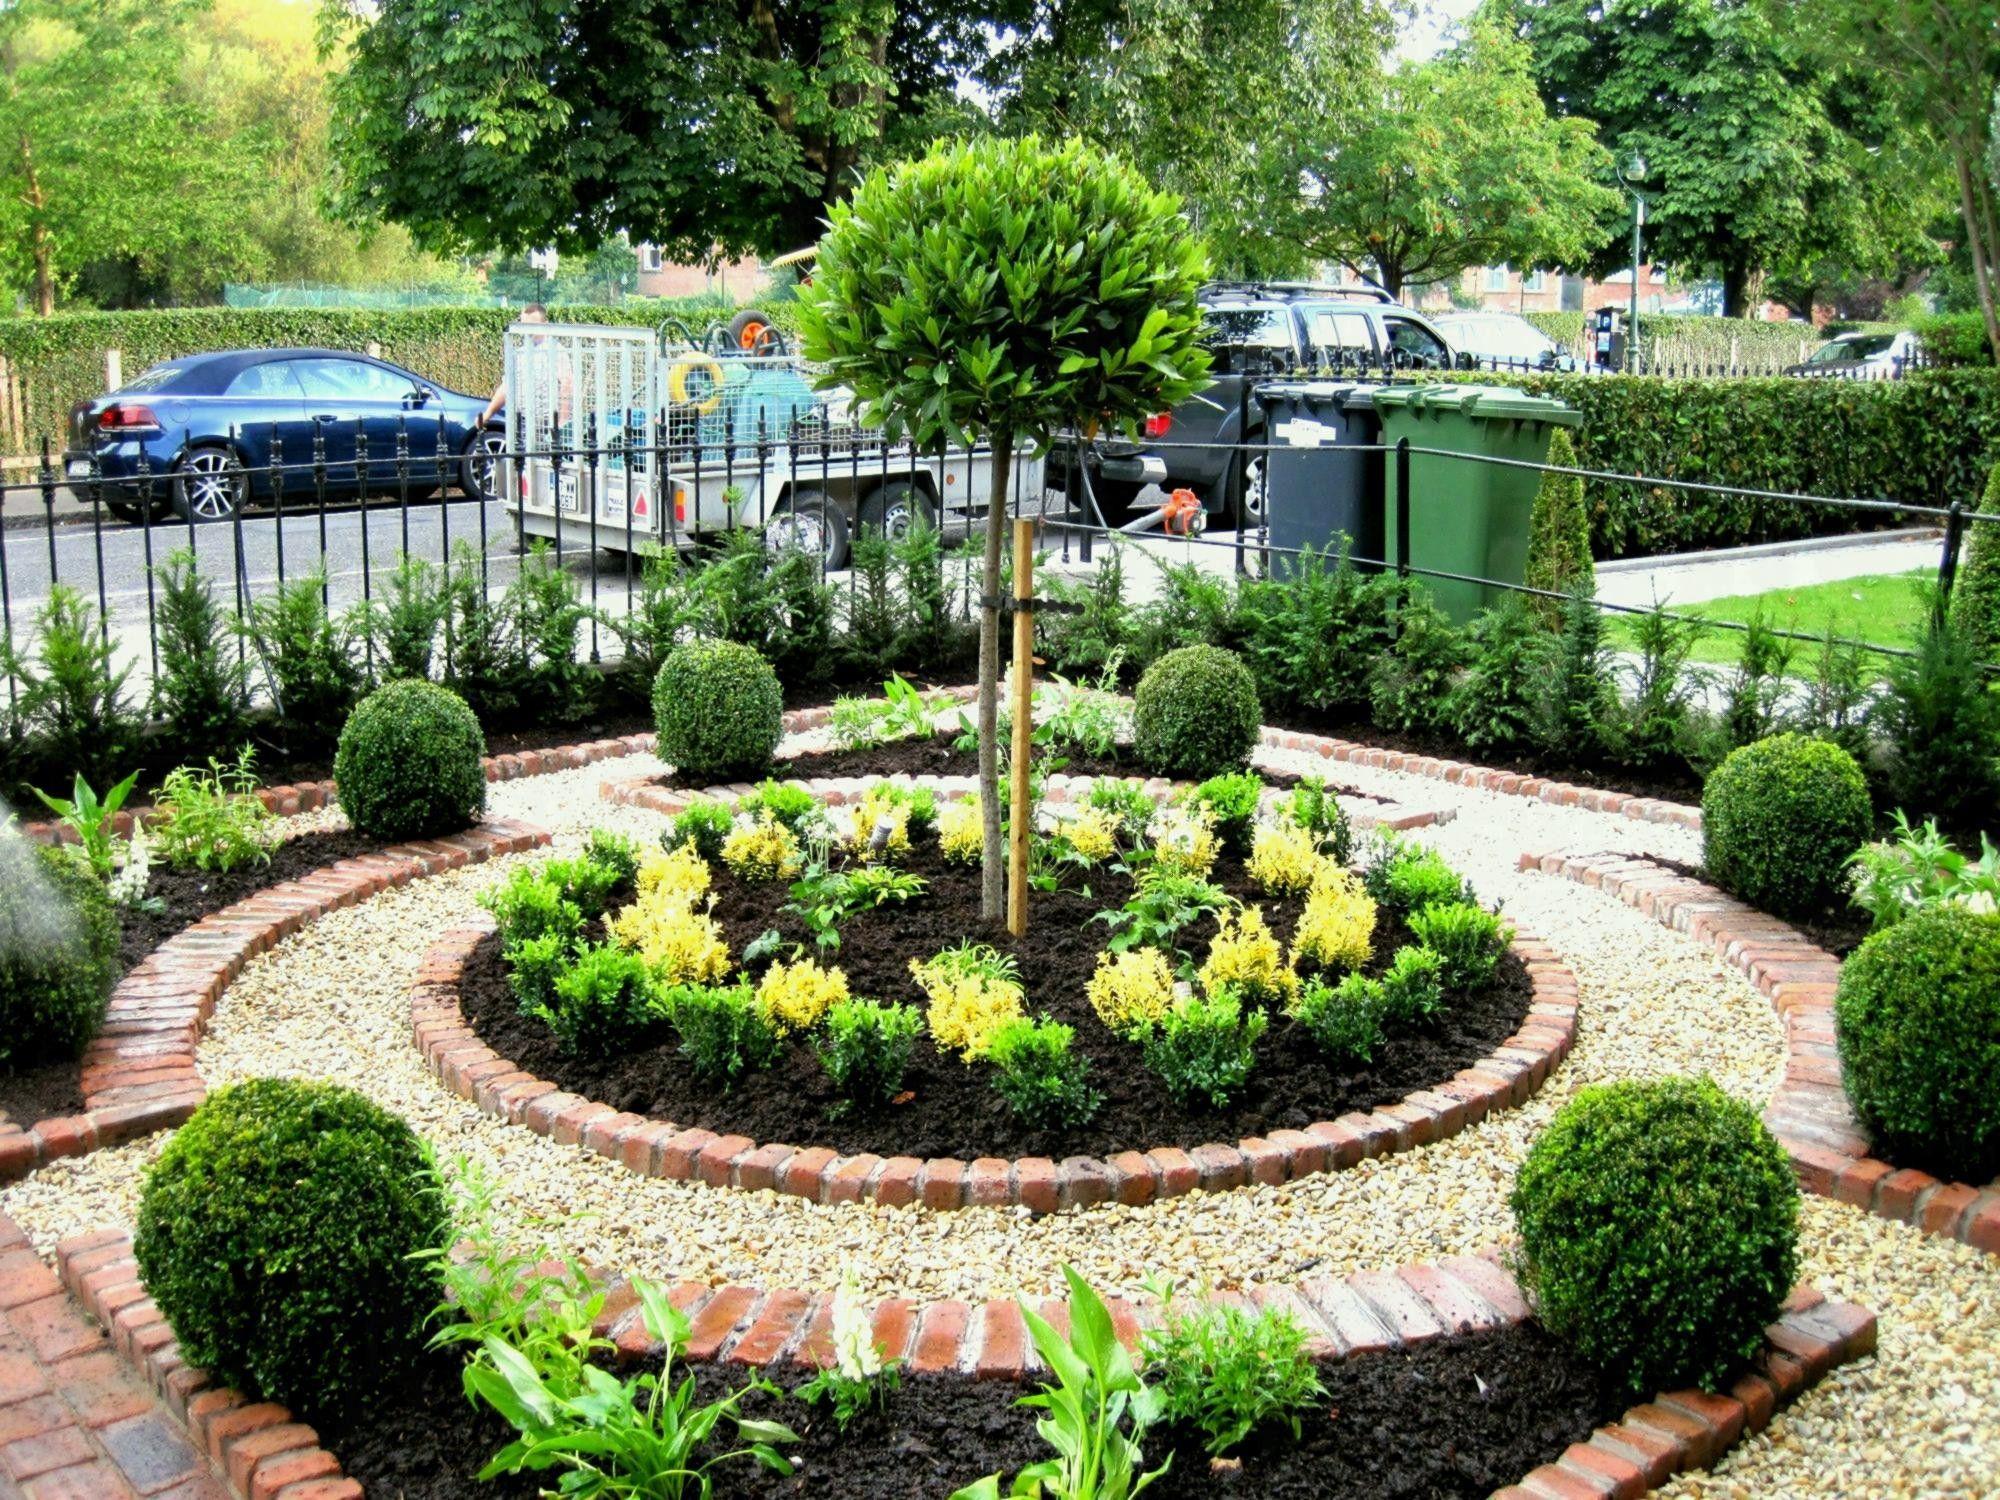 22+ Do it yourself landscaping ideas ideas in 2021